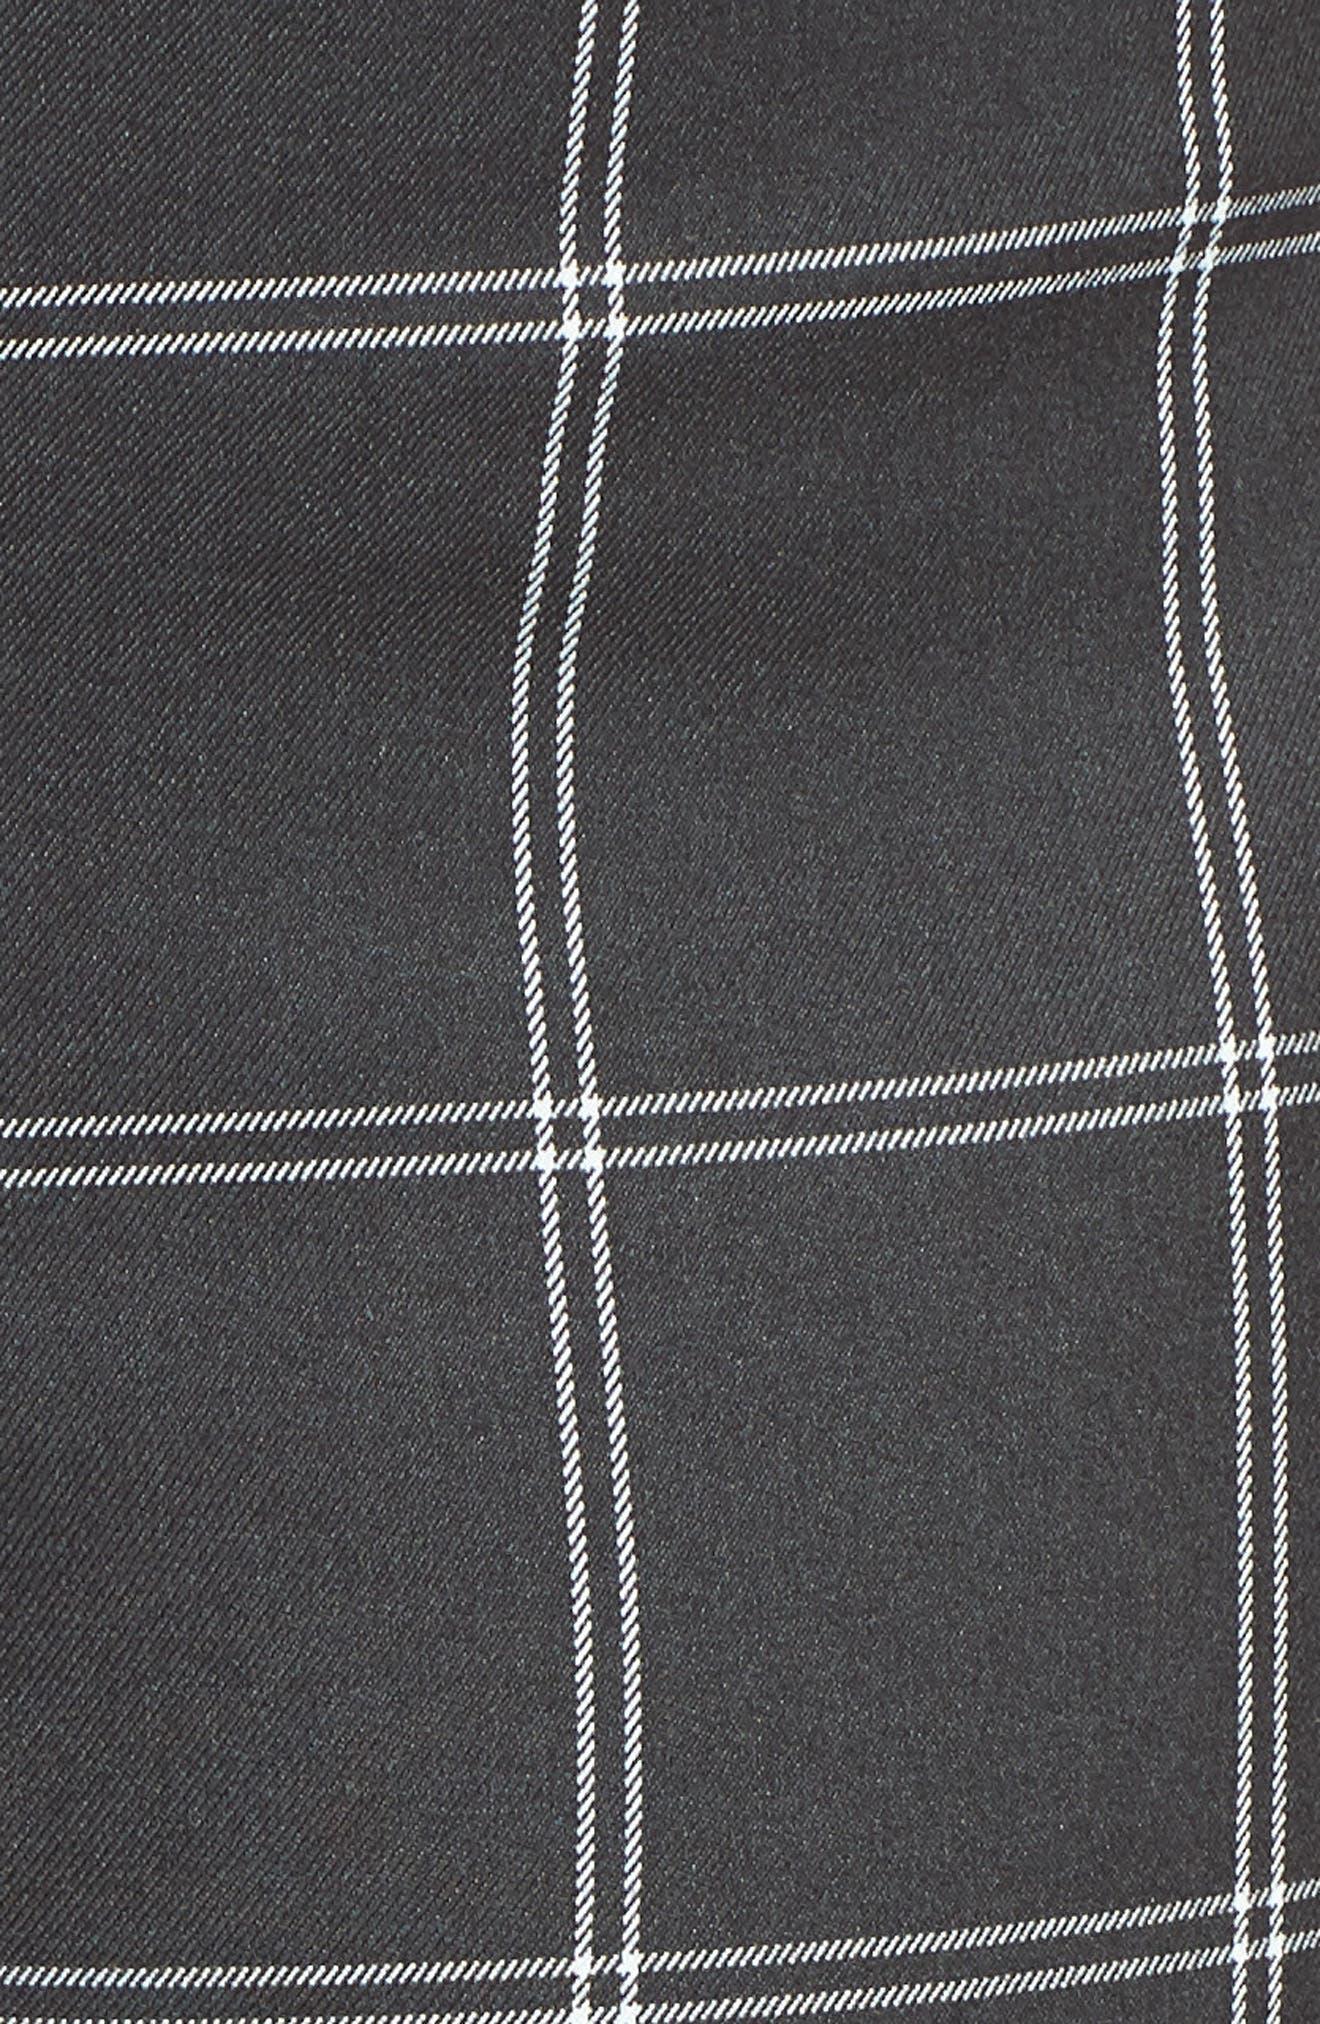 Windowpane Check Wide Leg Crop Pants,                             Alternate thumbnail 5, color,                             GREY TWILL PLAID